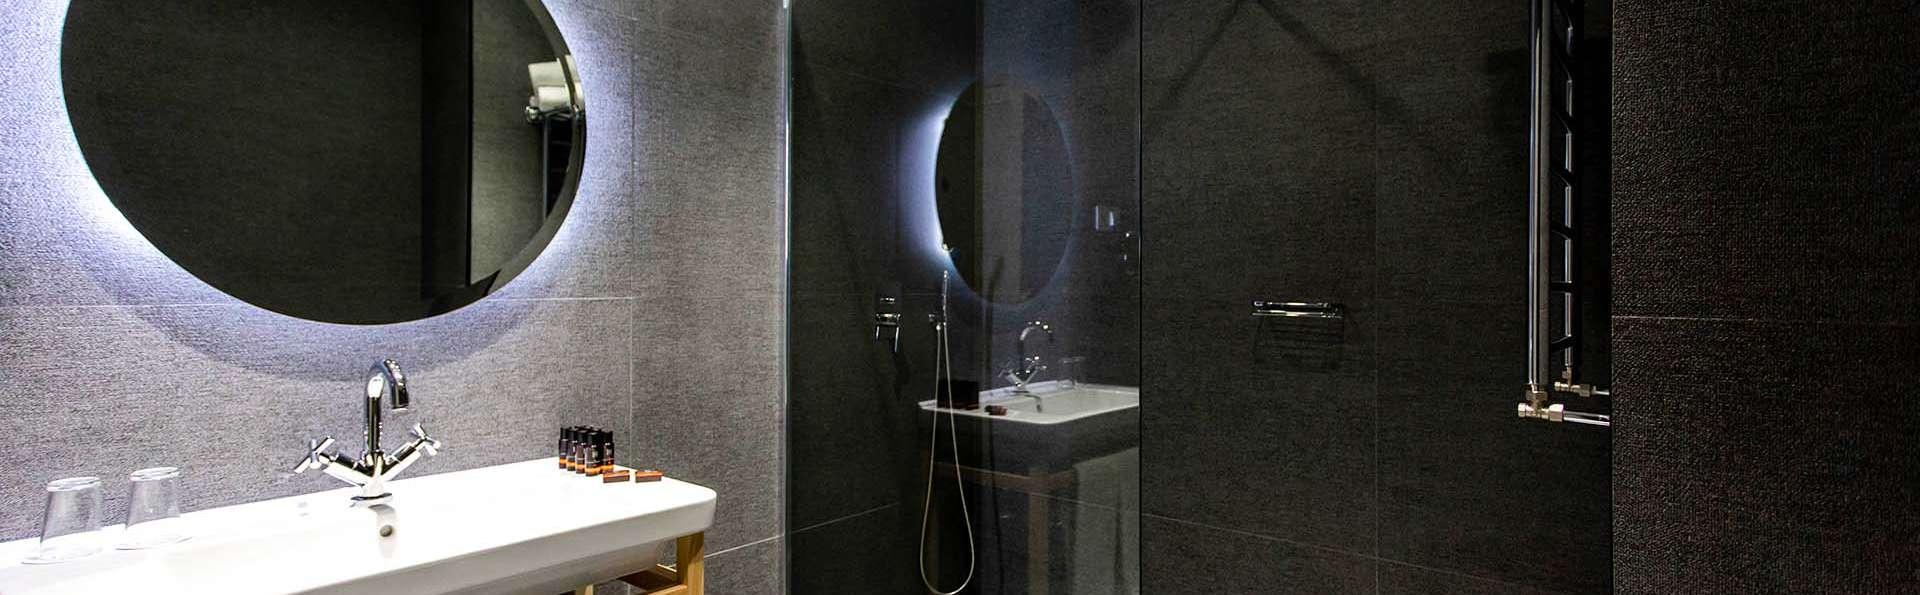 Hotel Pax Guadalajara - EDIT_HotelPaxGuadalajara_06.jpg